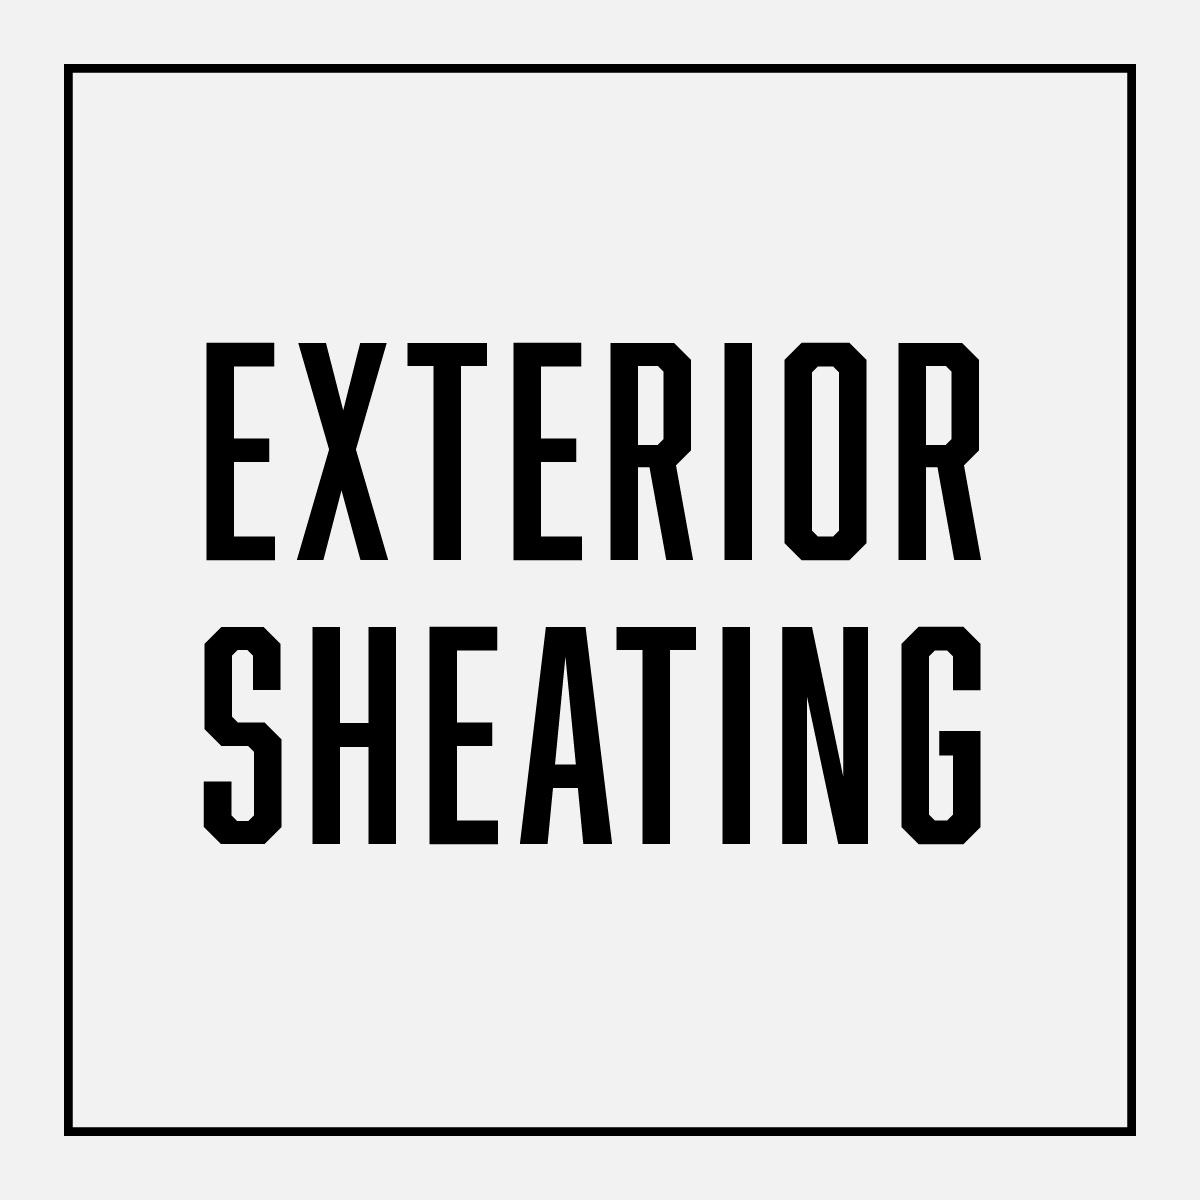 exterior-sheating